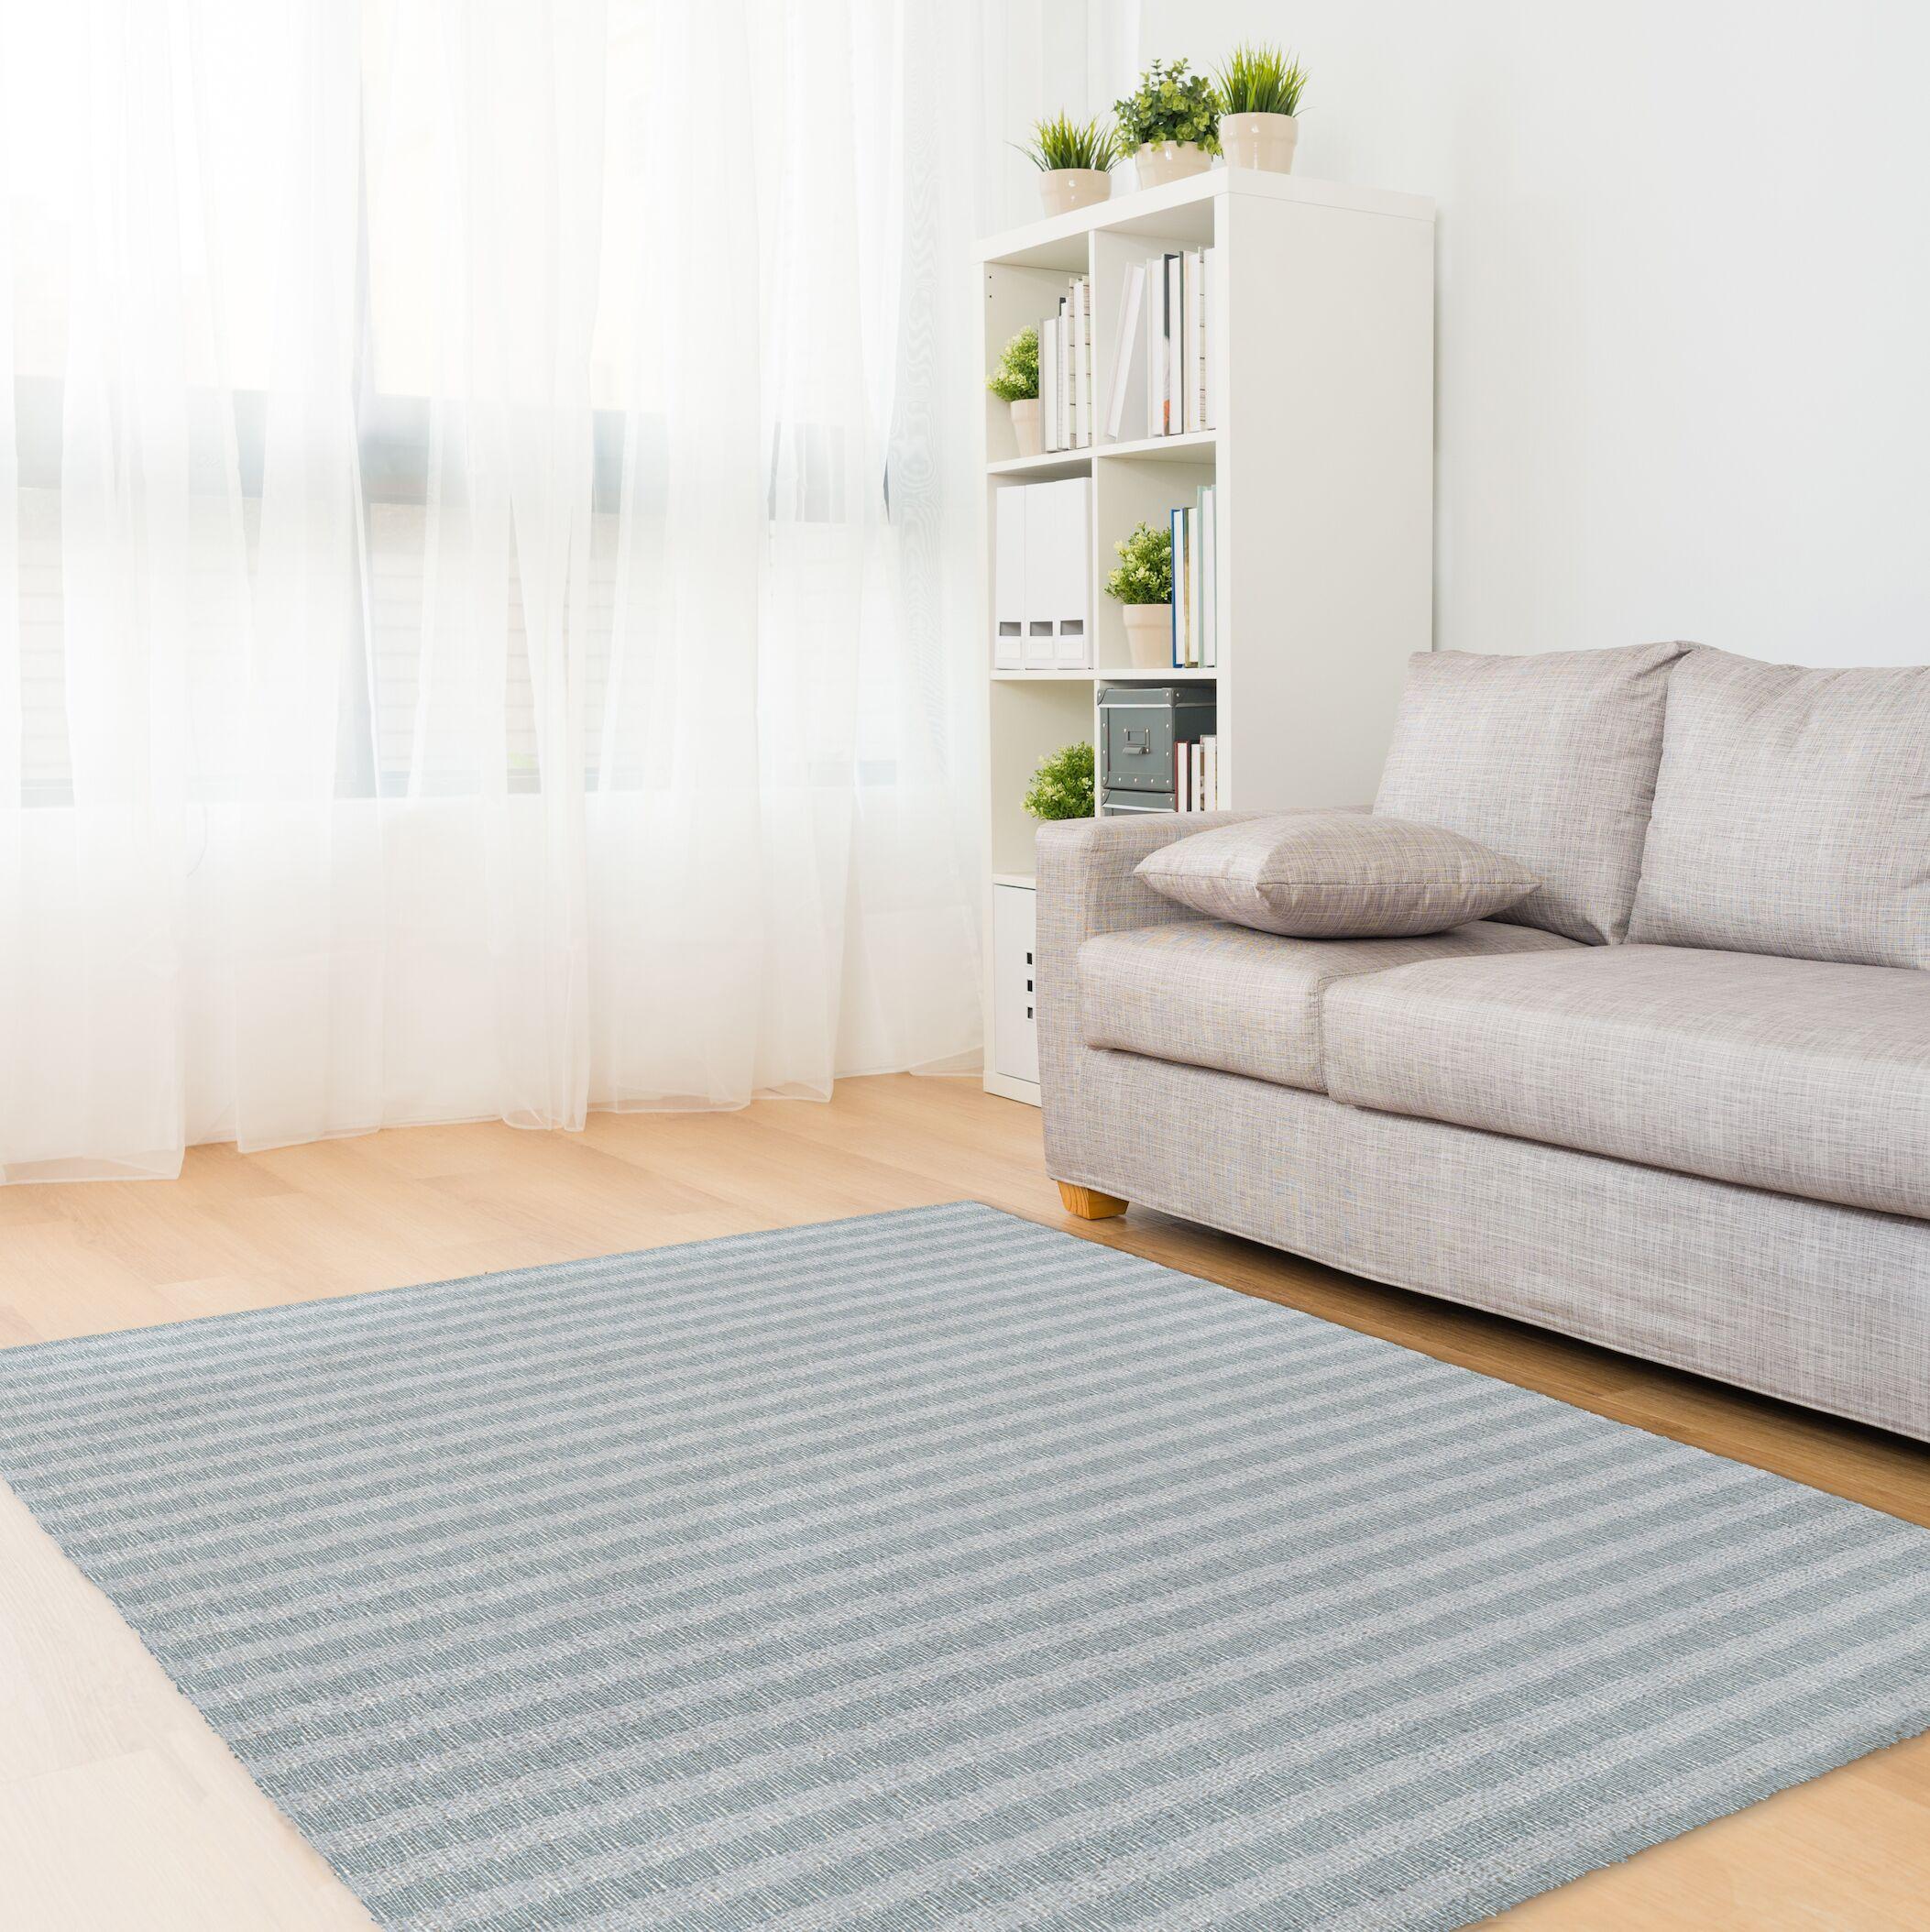 Heidelberg Blue/Teal Area Rug Rug Size: Rectangle 5' x 7'